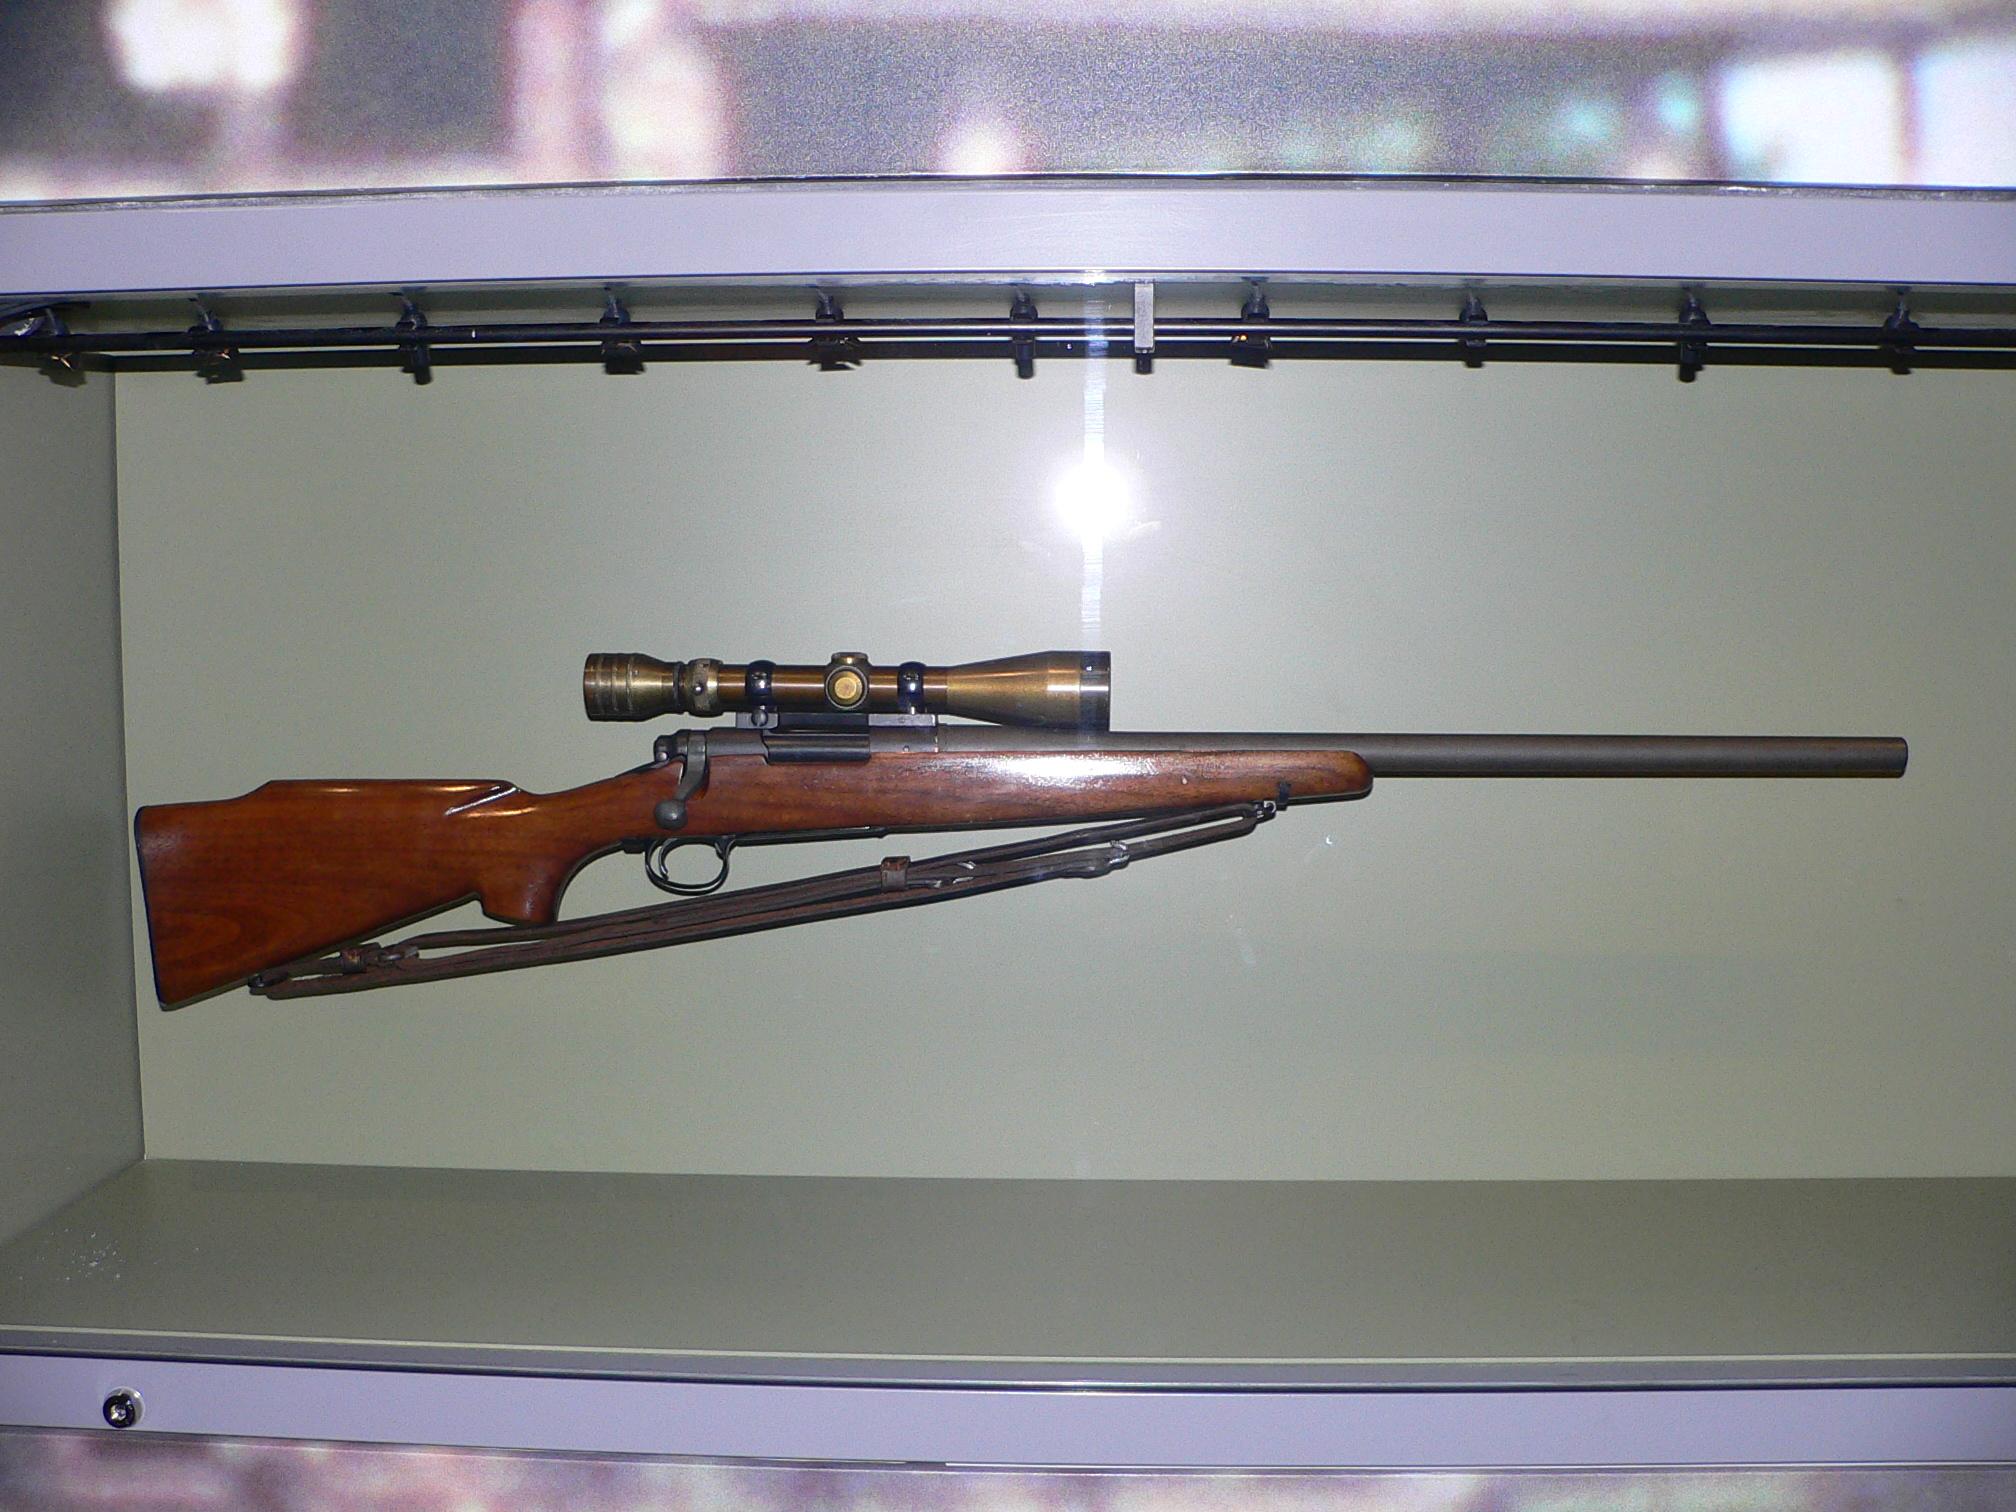 File:Chuck Mawhinney's sniper rifle.jpg - Wikimedia Commons